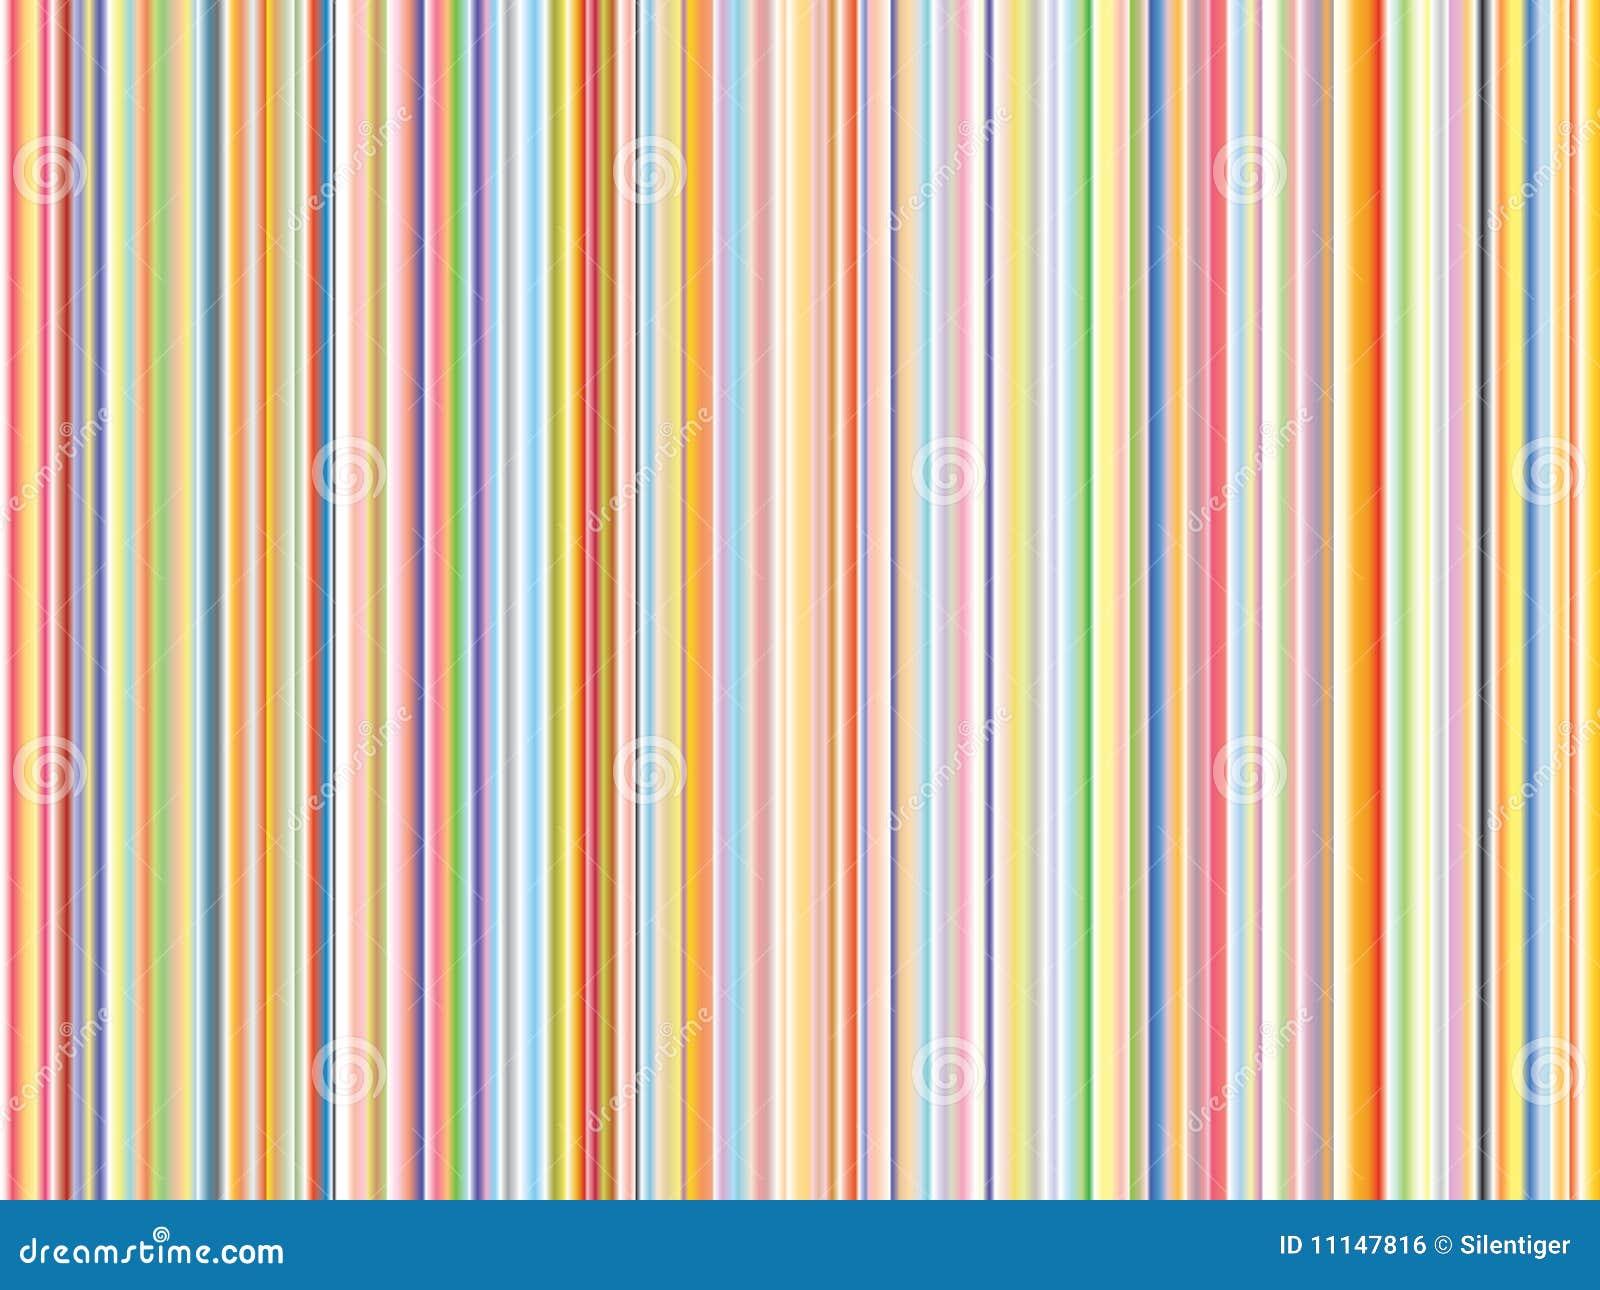 Righe Colorate Immagine Stock Libera da Diritti - Immagine: 11147816